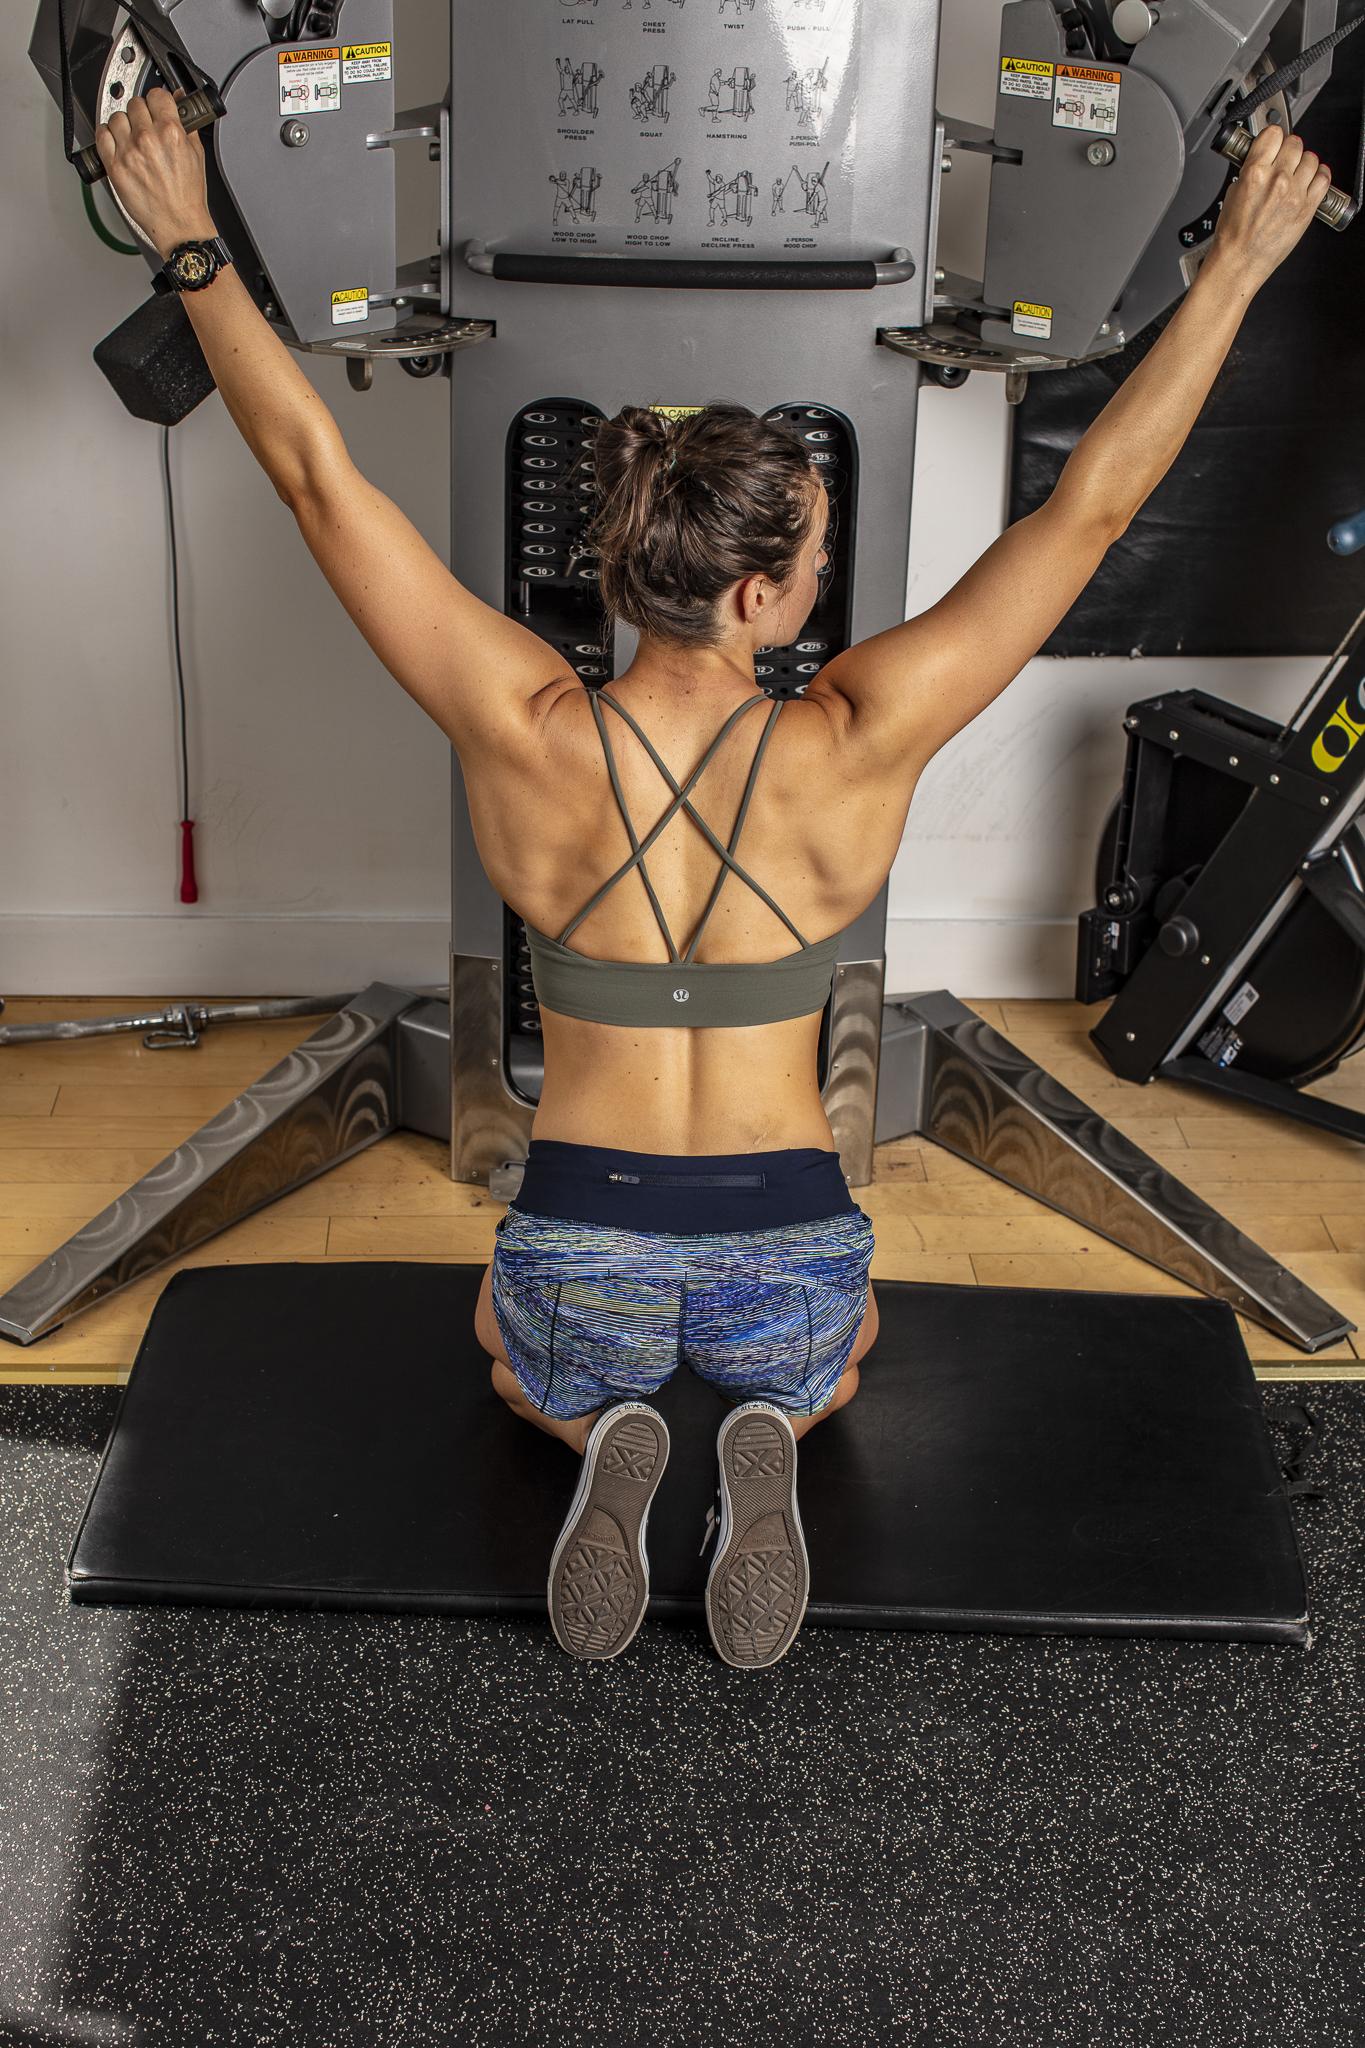 Sara Boyd - Fitness Coach - UvU Fitness - Reduced Edits - 09 Jun '19 - 01.JPG